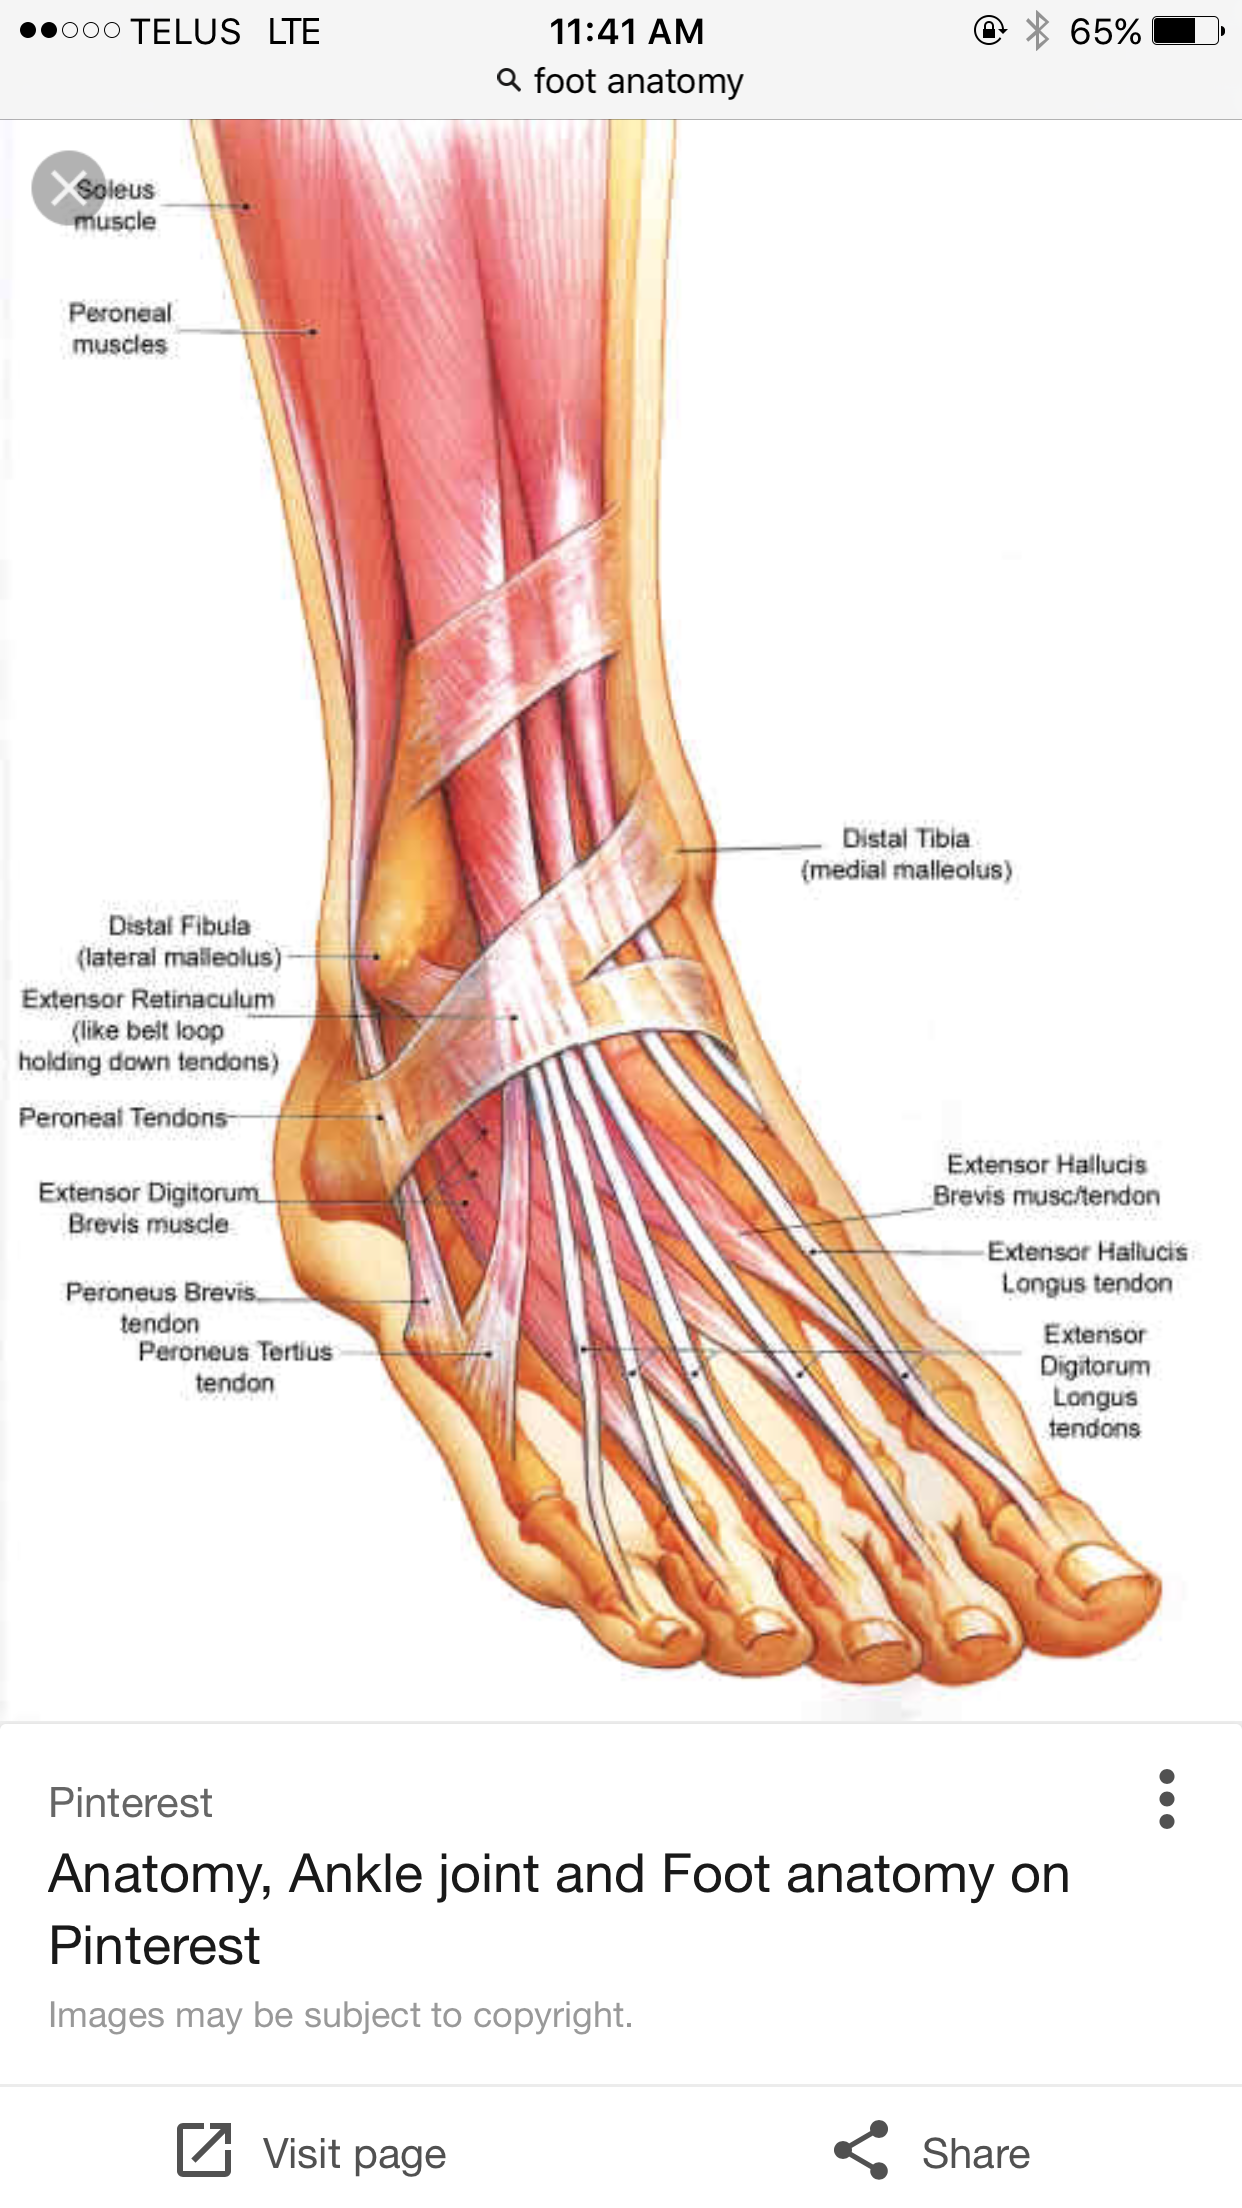 small resolution of myndani ursta a fyrir latin words for nerves in feet anatomy